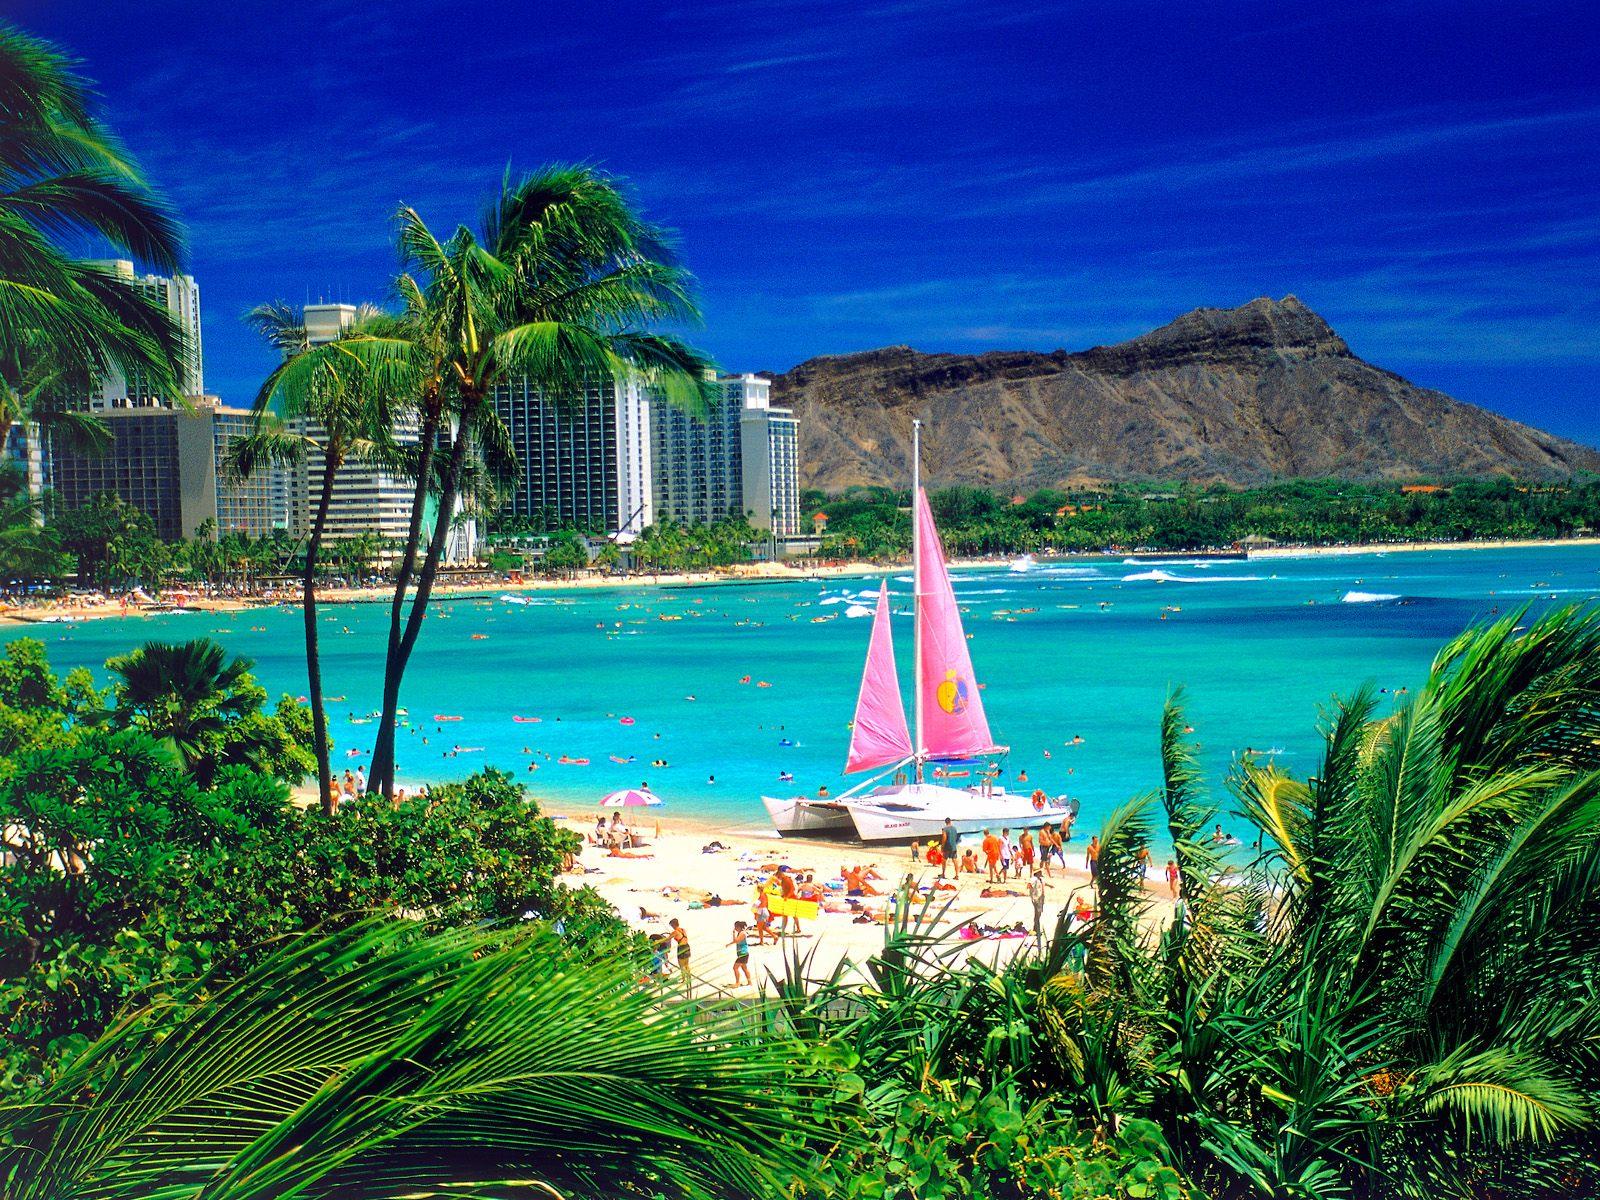 Waikiki Oahu Hawaii Wallpapers   HD Wallpapers